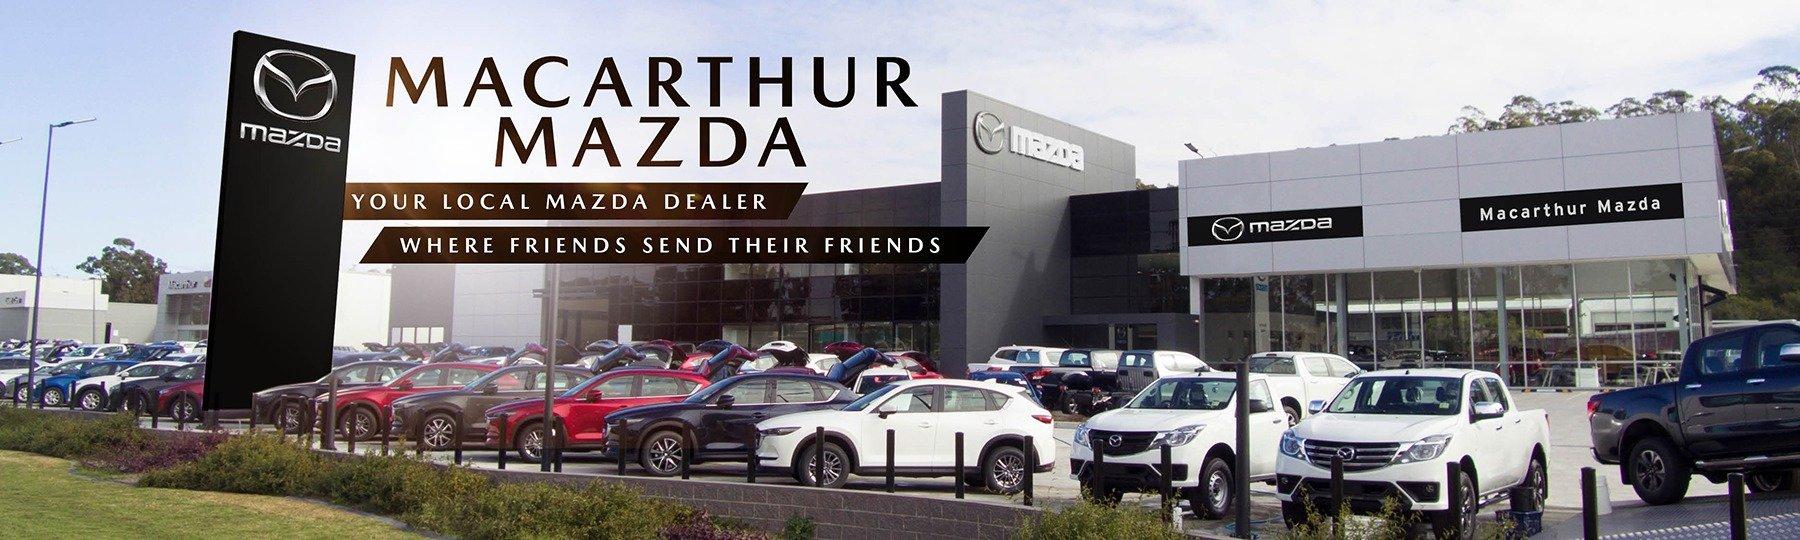 Macarthur Mazda Dealership